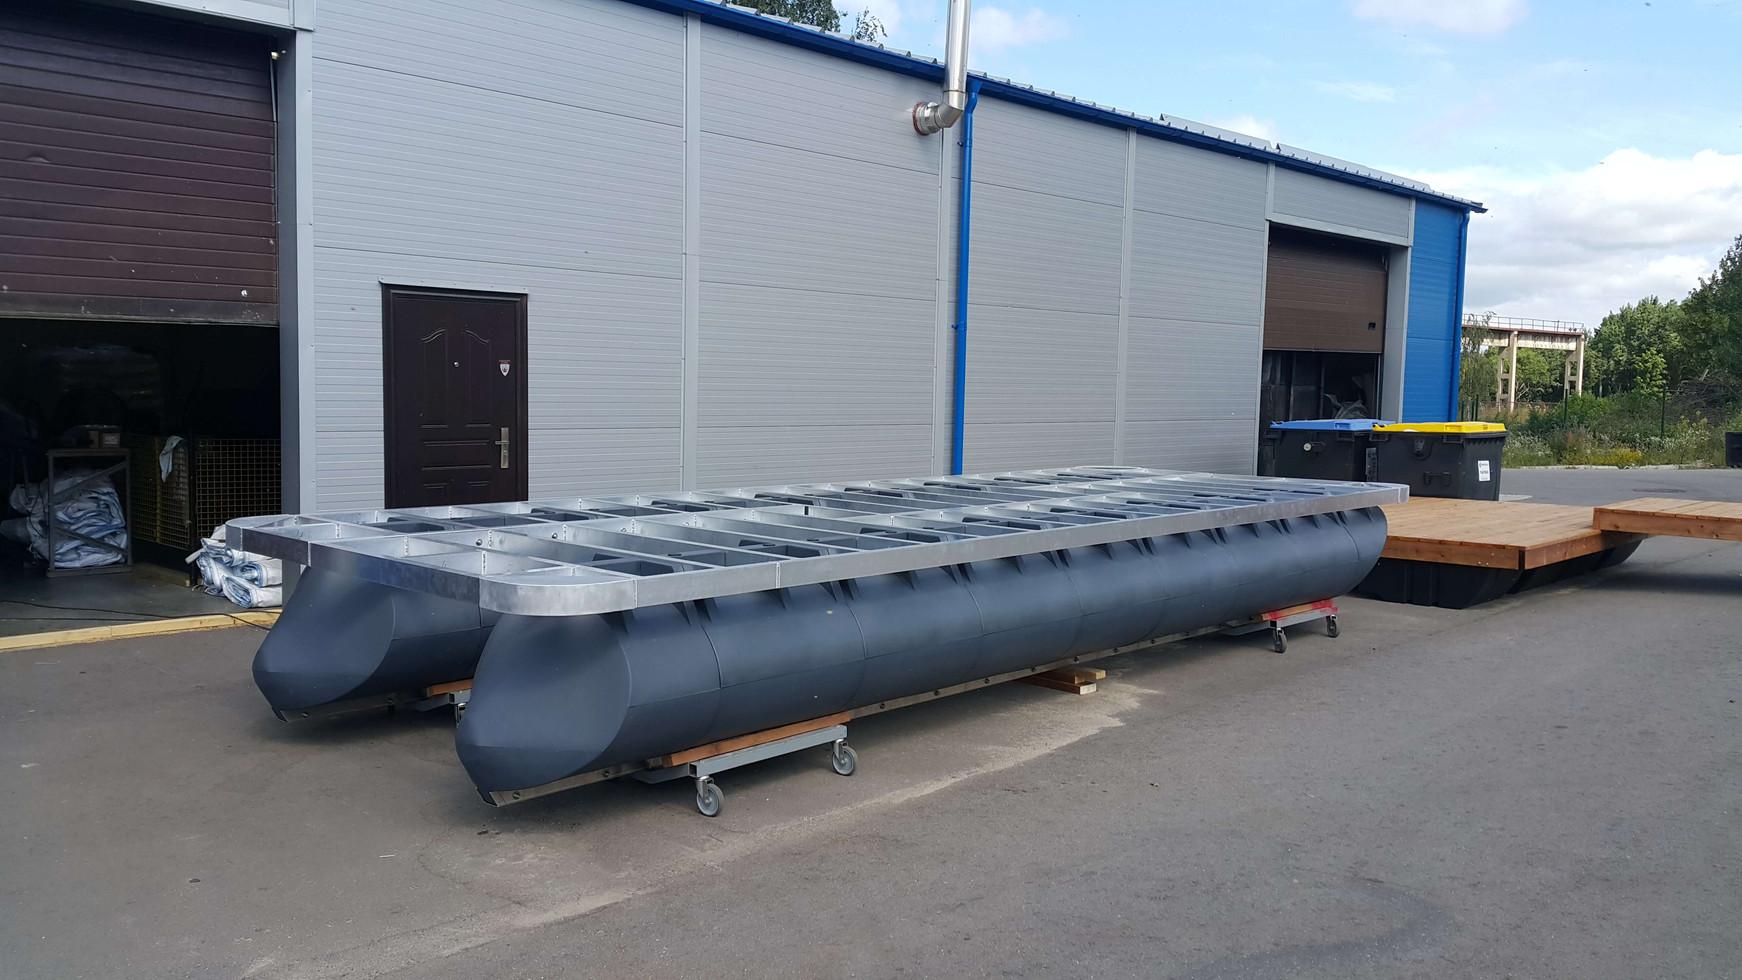 7,4m x 3m special order catamaran